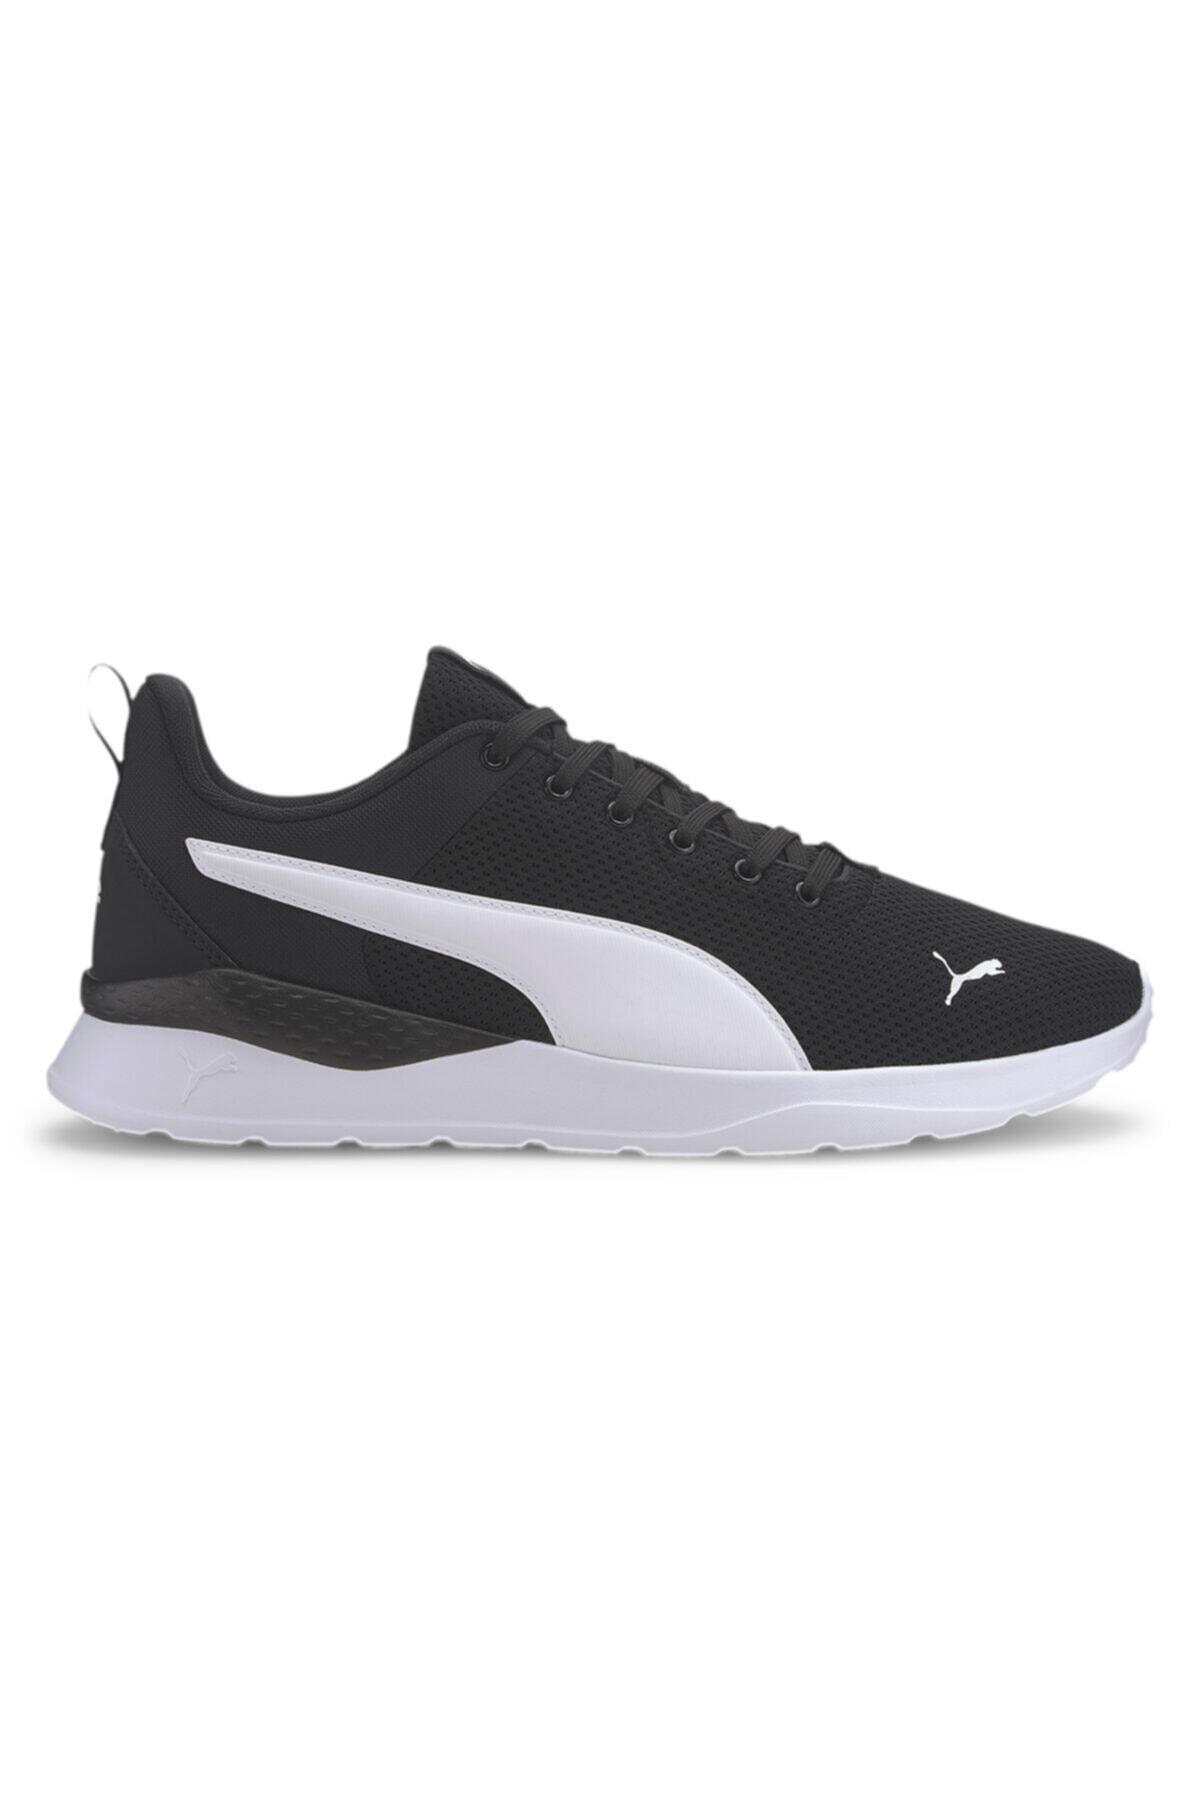 Puma ANZARUN LITE Siyah Erkek Koşu Ayakkabısı 100644556 2